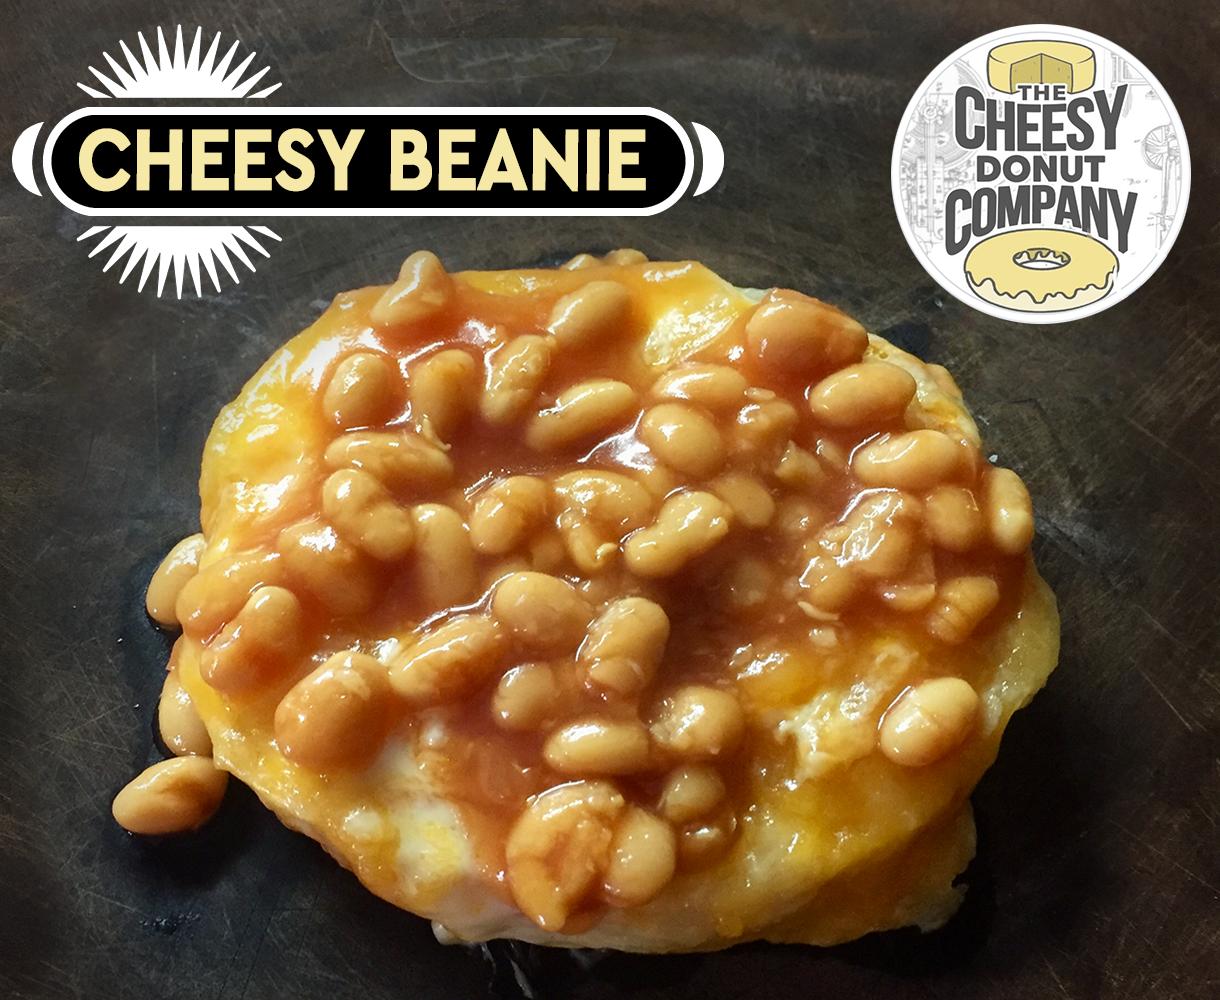 English Cheesy Beanie